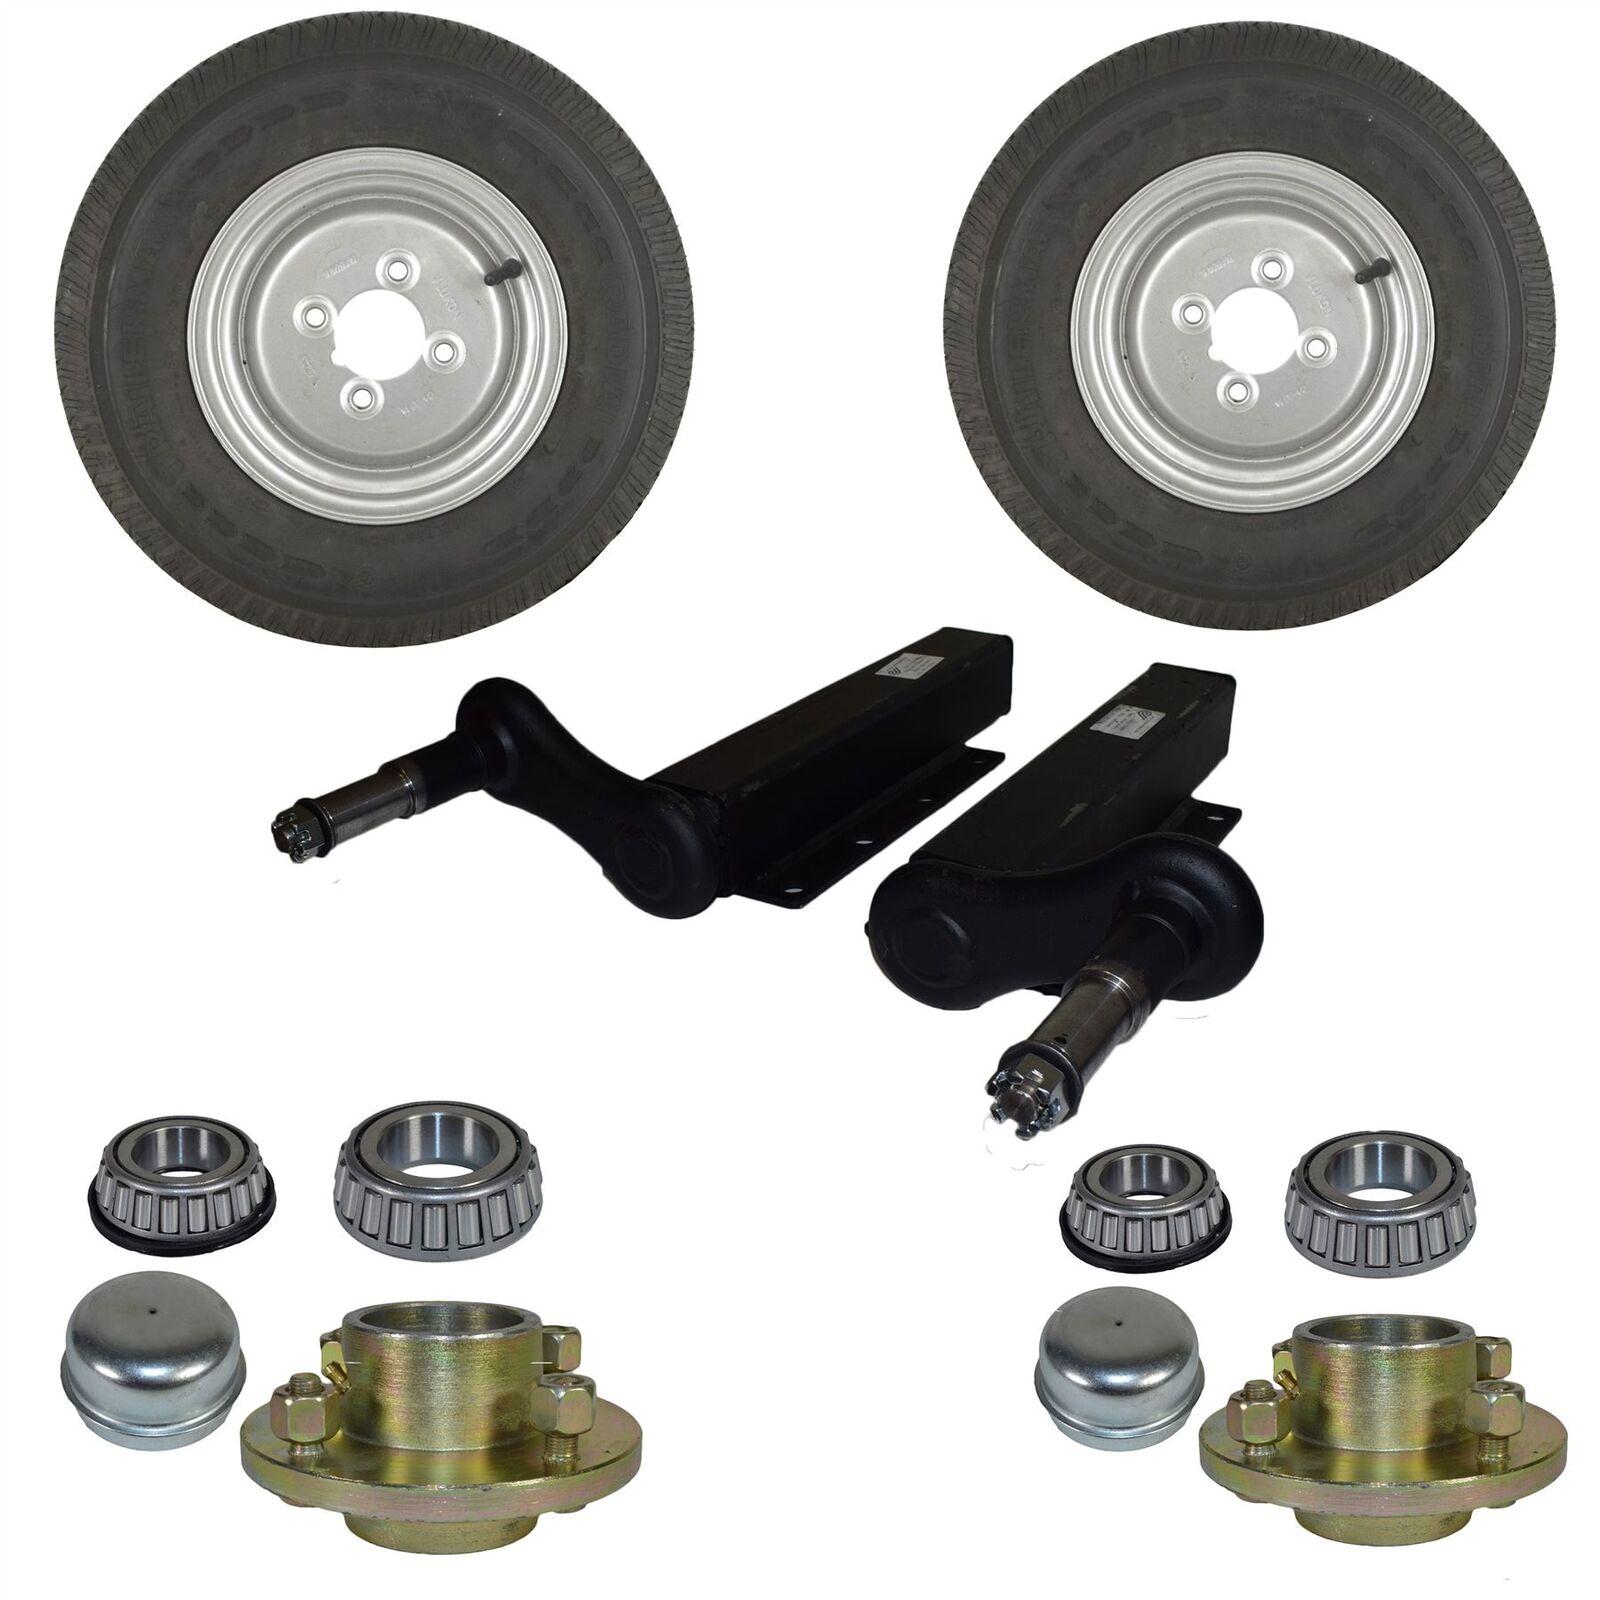 750kg Suspension Units Hubs Mini Wheels Extended Stubs Trailer 23.5mm Offset